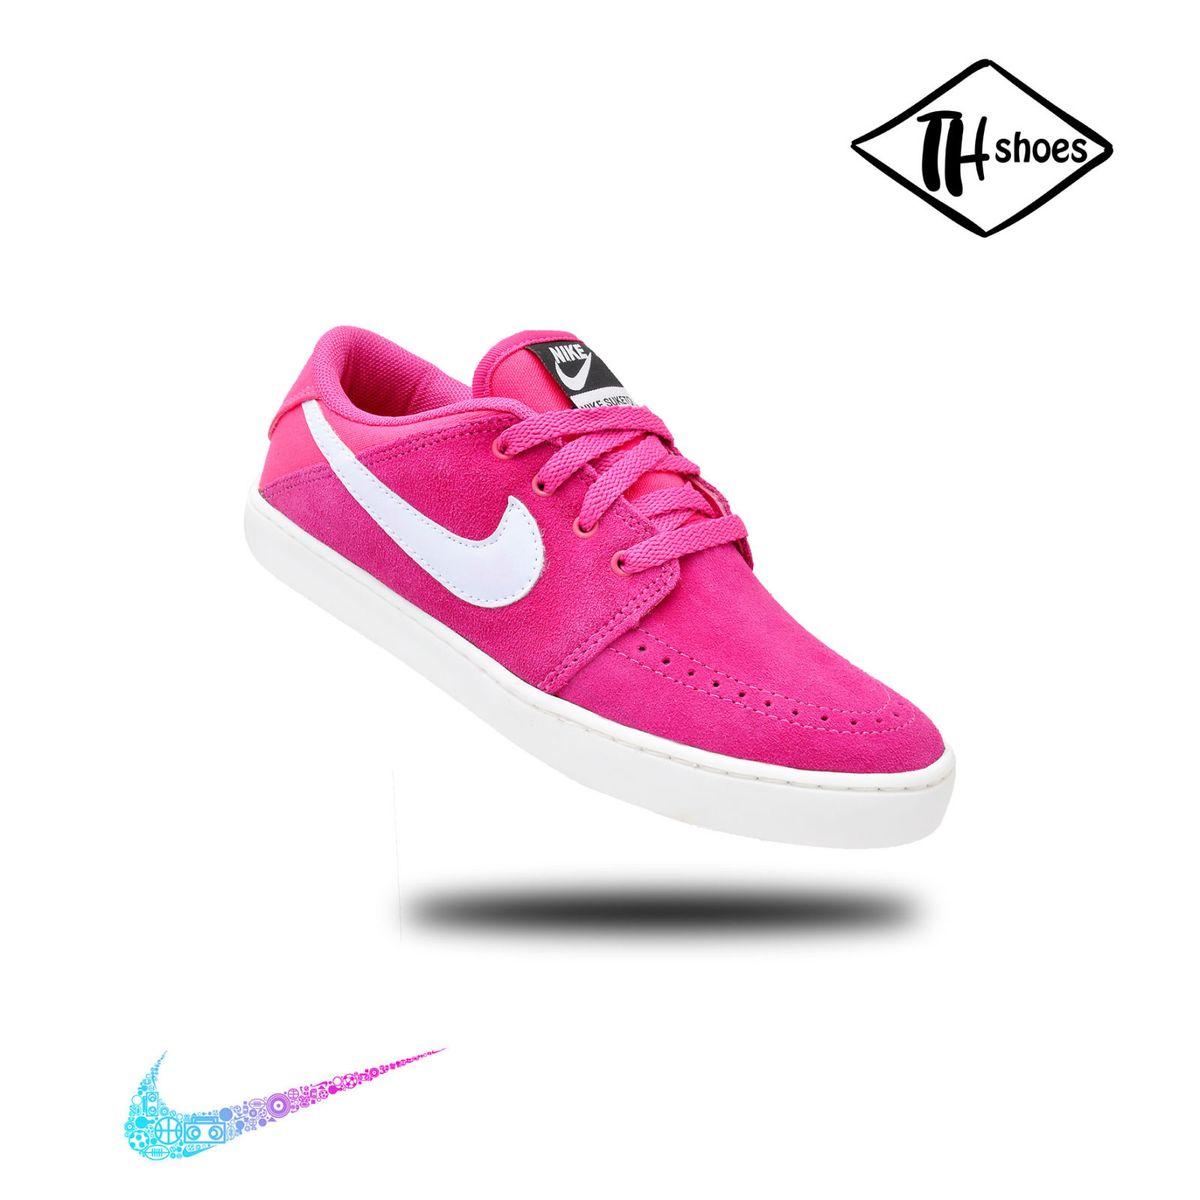 8b013f26ae9 Tênis Nike Suketo Feminino Cano Baixo